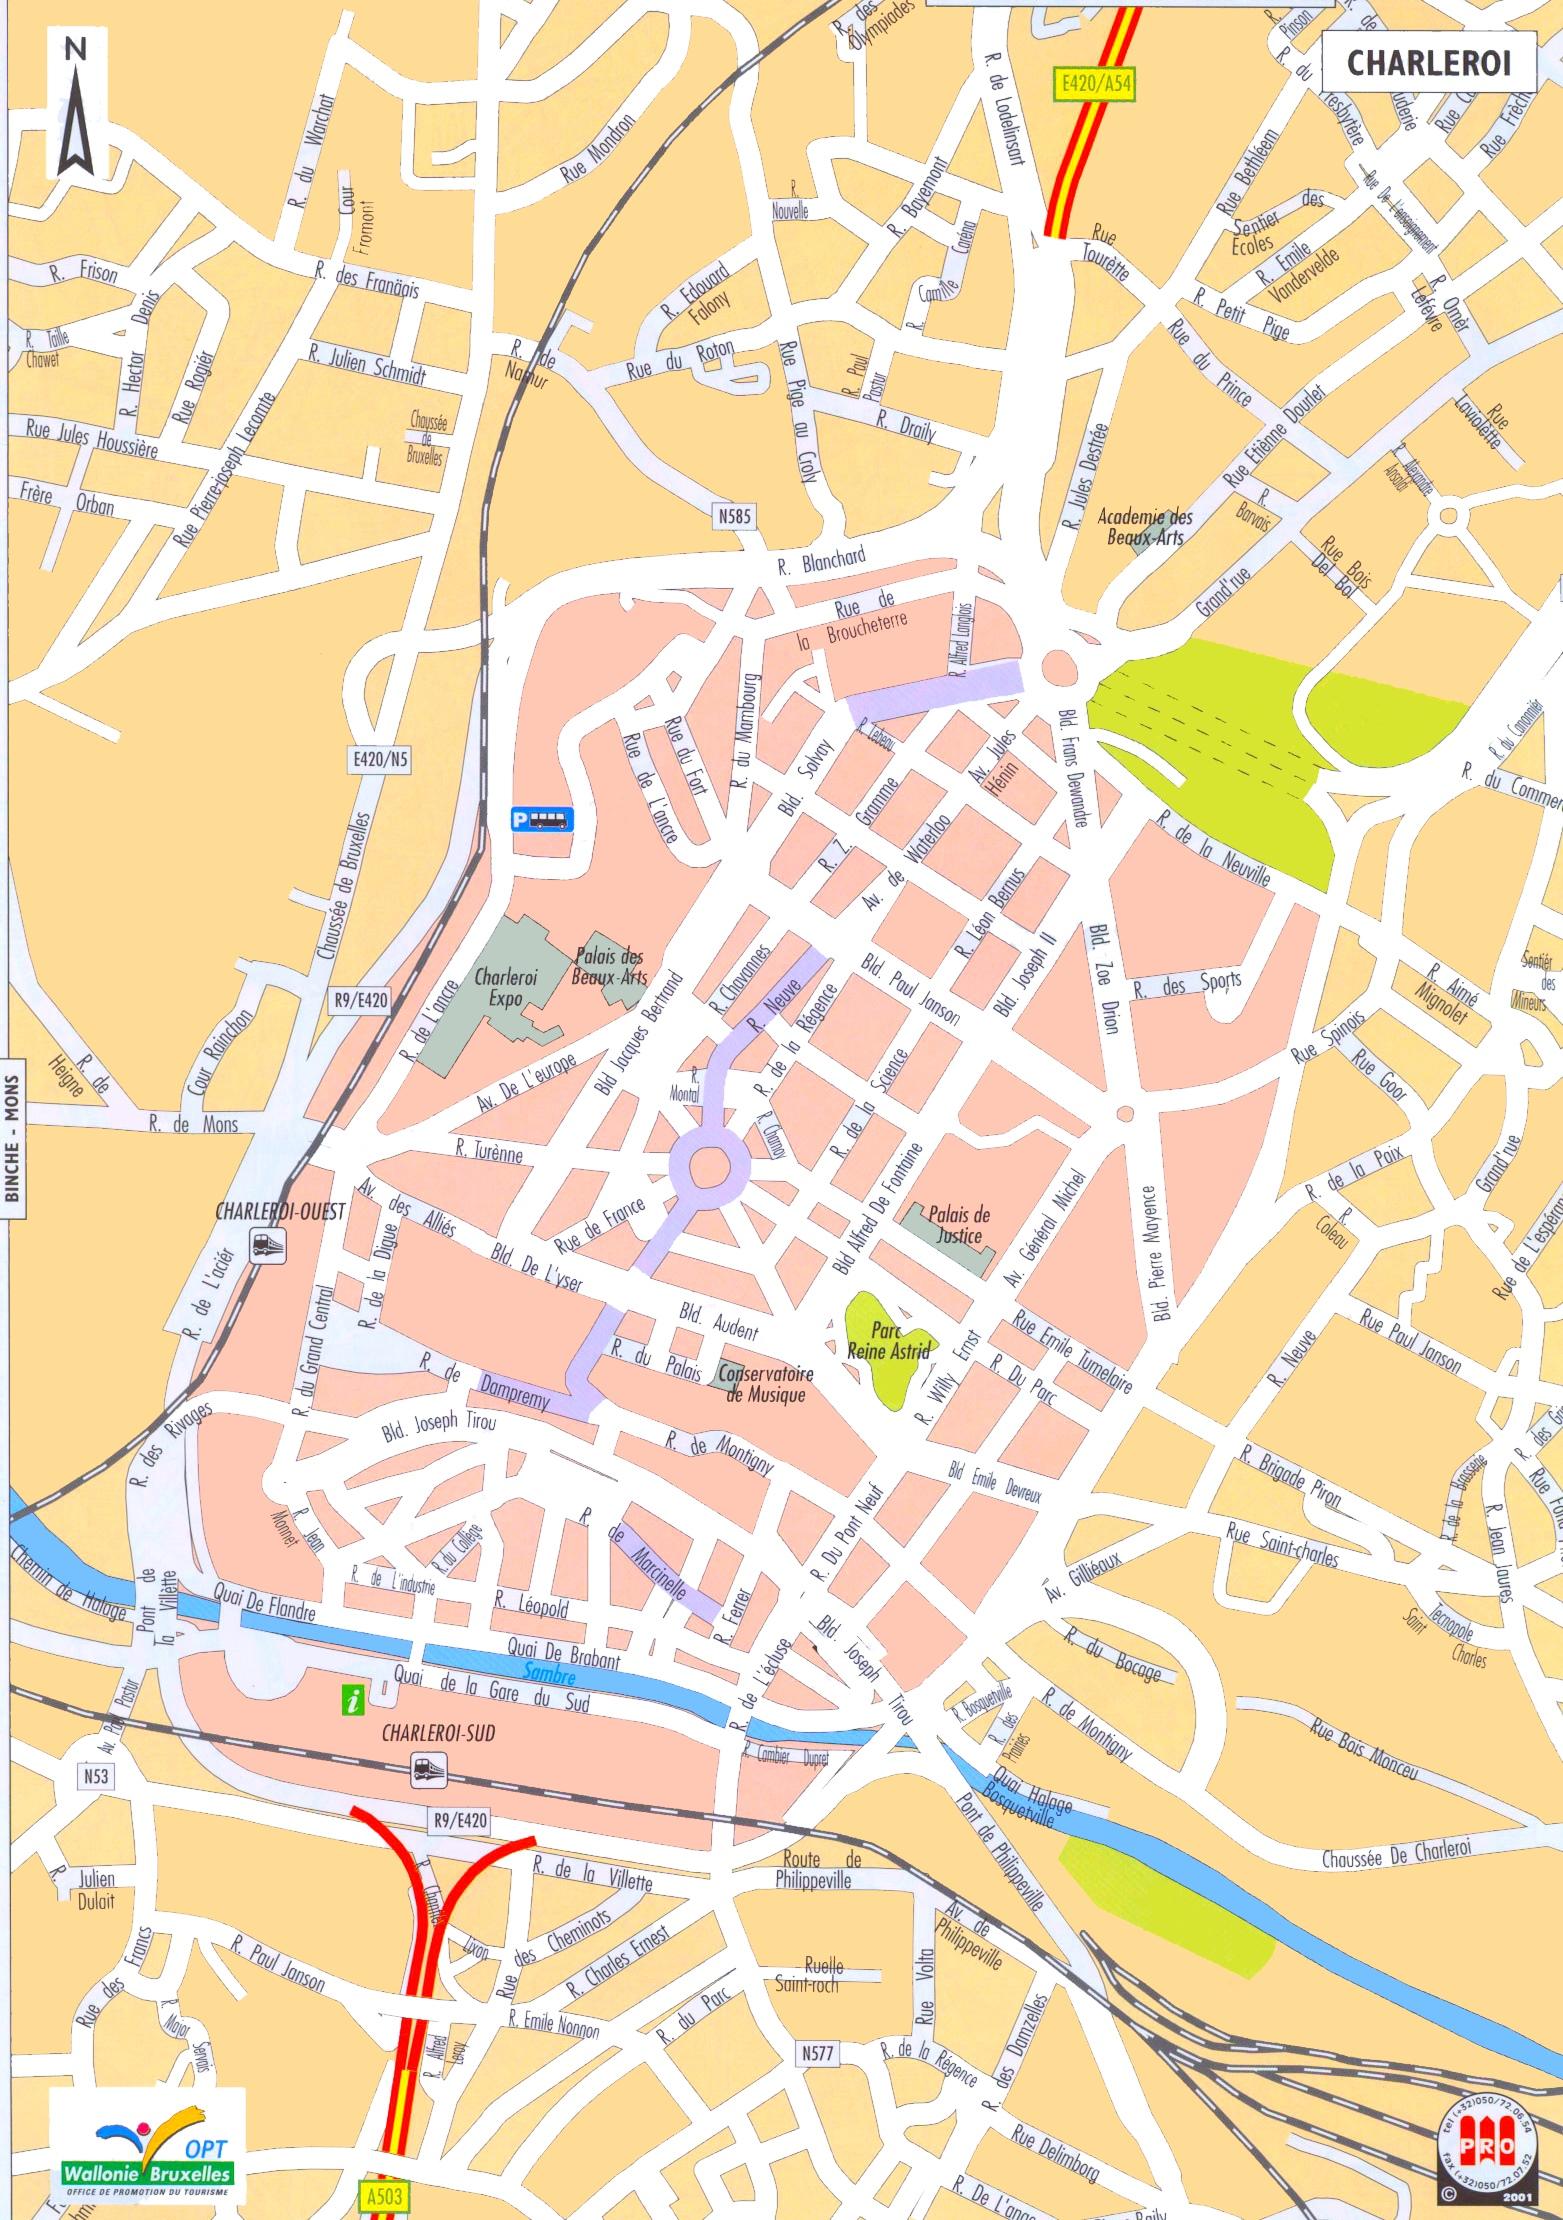 chur tourist map » ..:: Edi Maps ::..   Full HD Maps